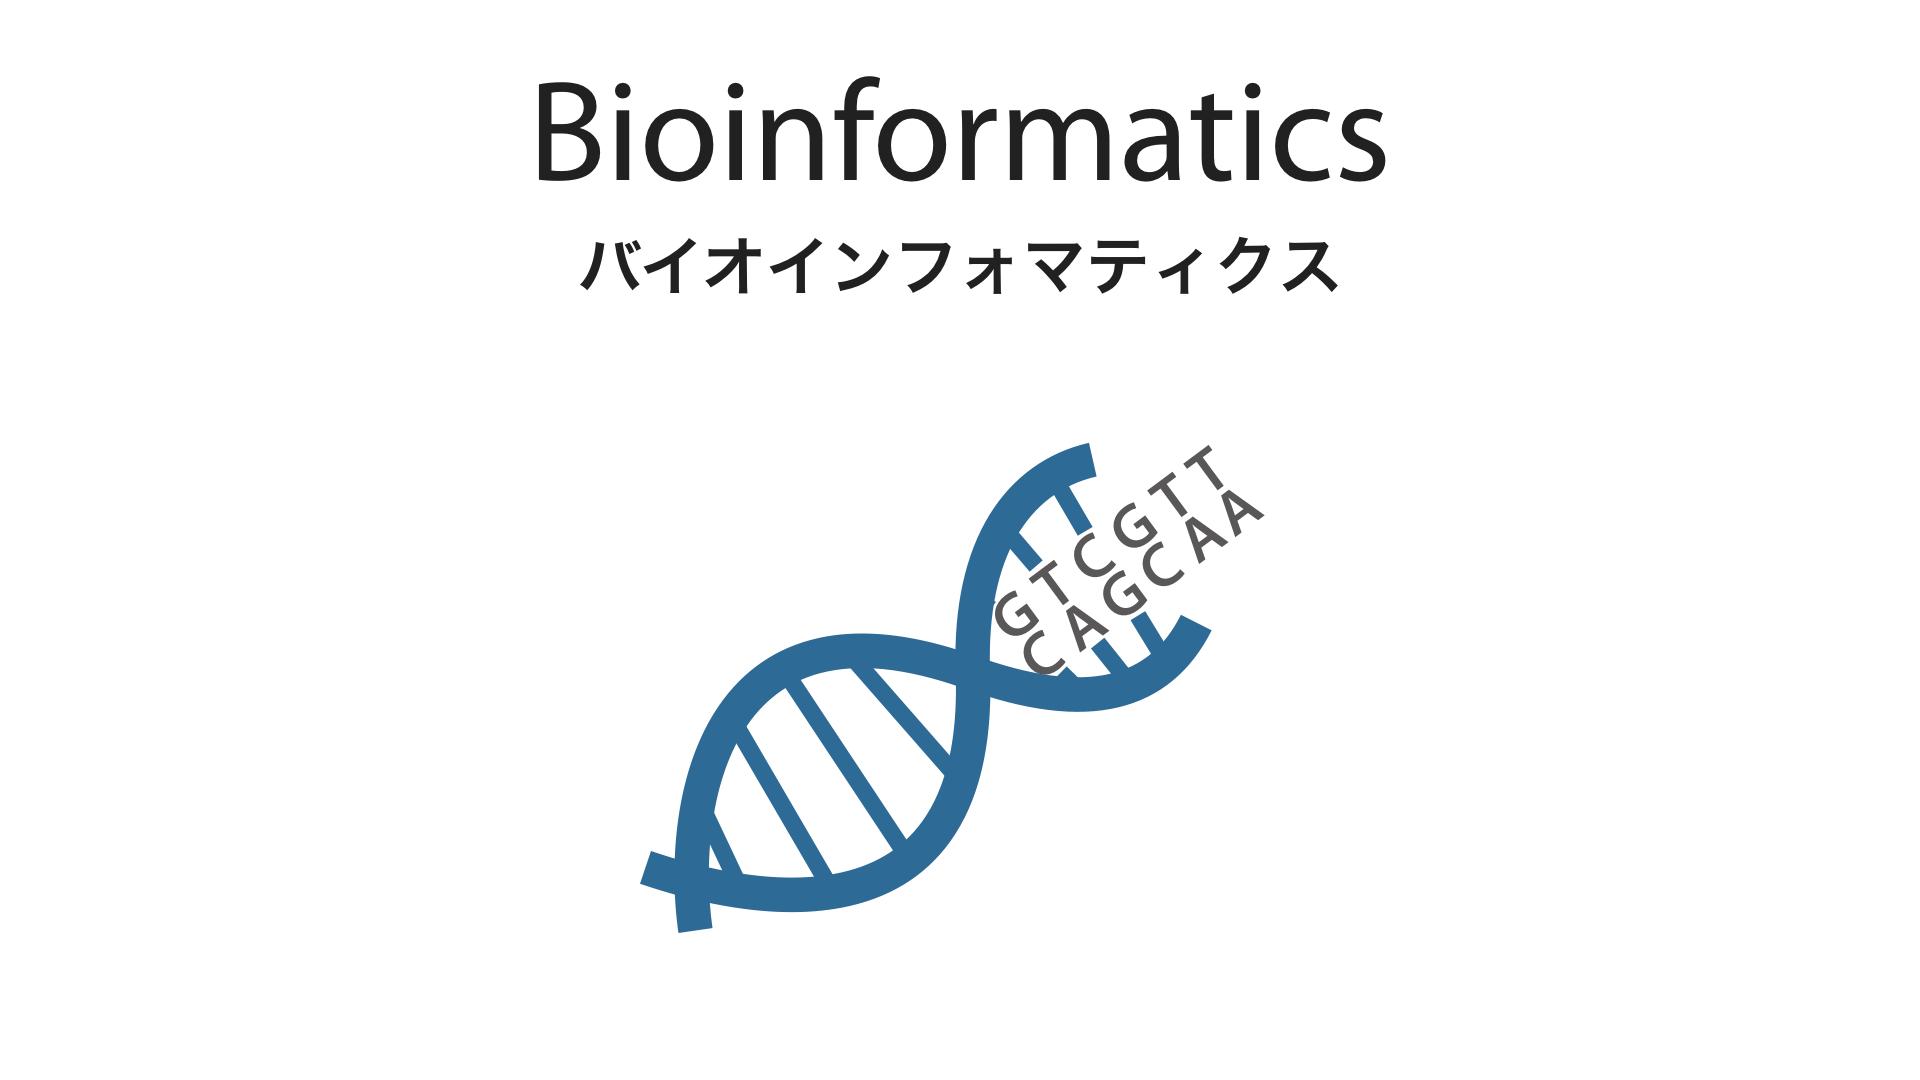 Bioinformatics バイオインフォマティクス